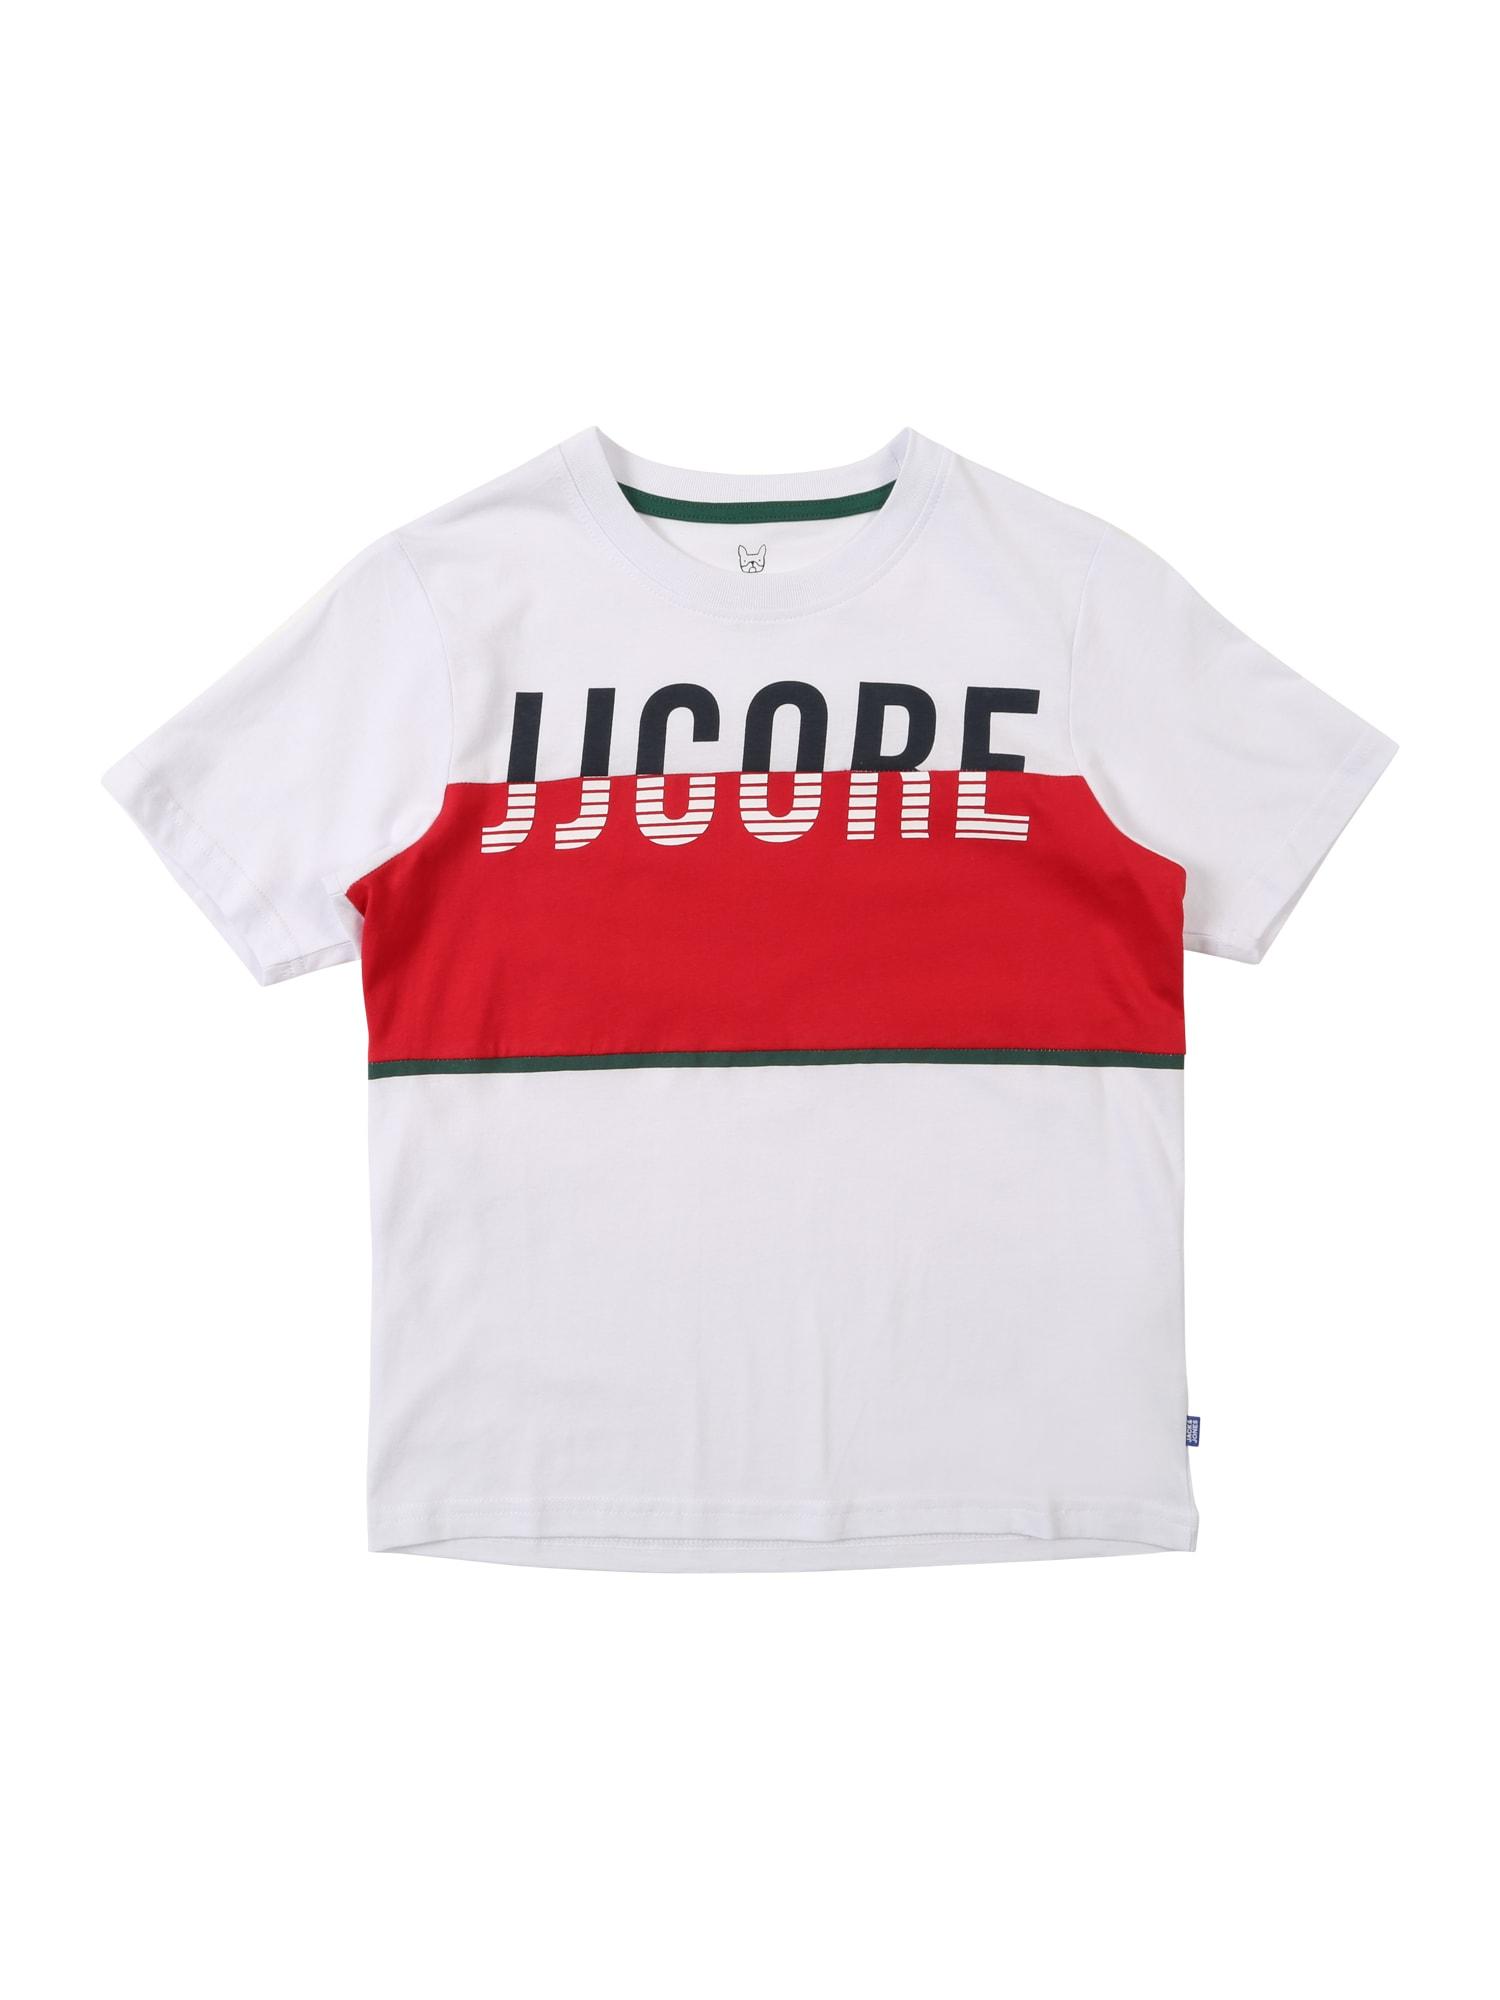 Tričko VIKING antracitová červená bílá Jack & Jones Junior